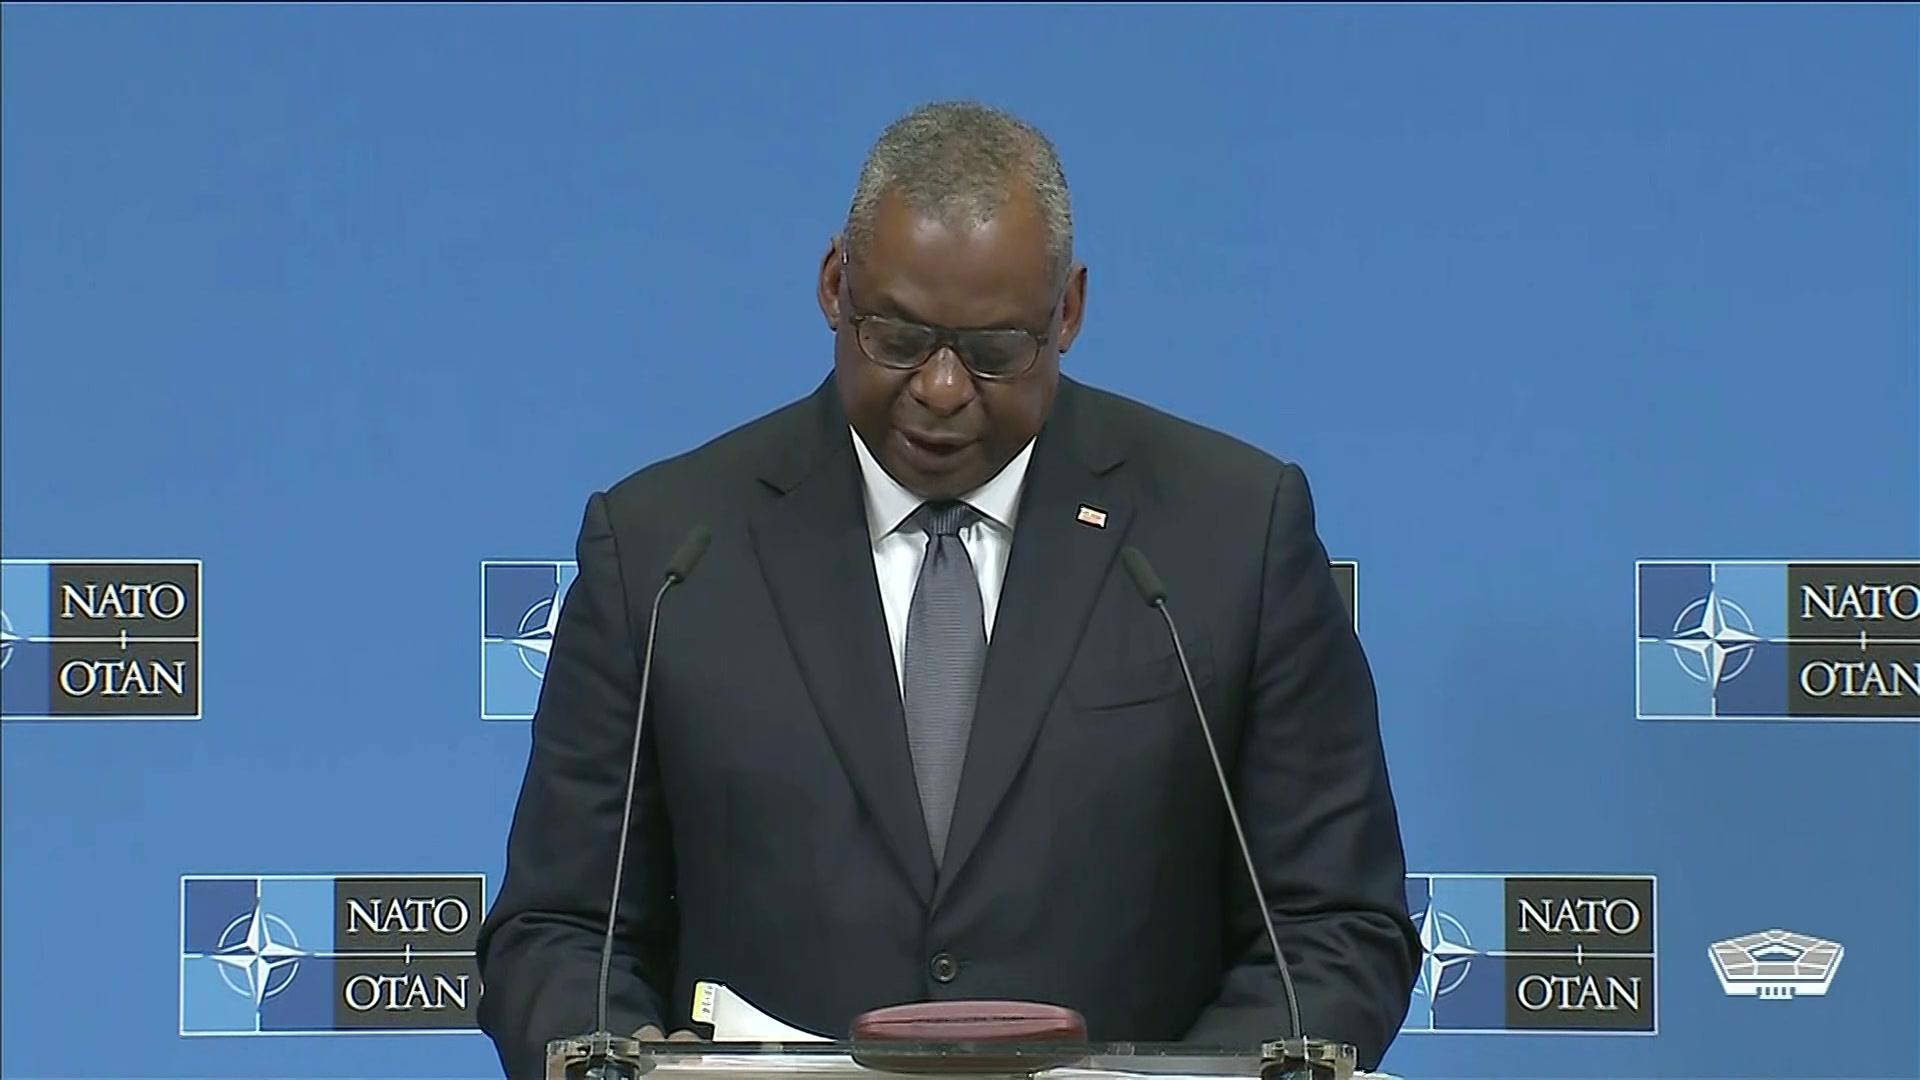 Secretary of Defense Lloyd J. Austin III participates in a NATO press conference in Brussels.